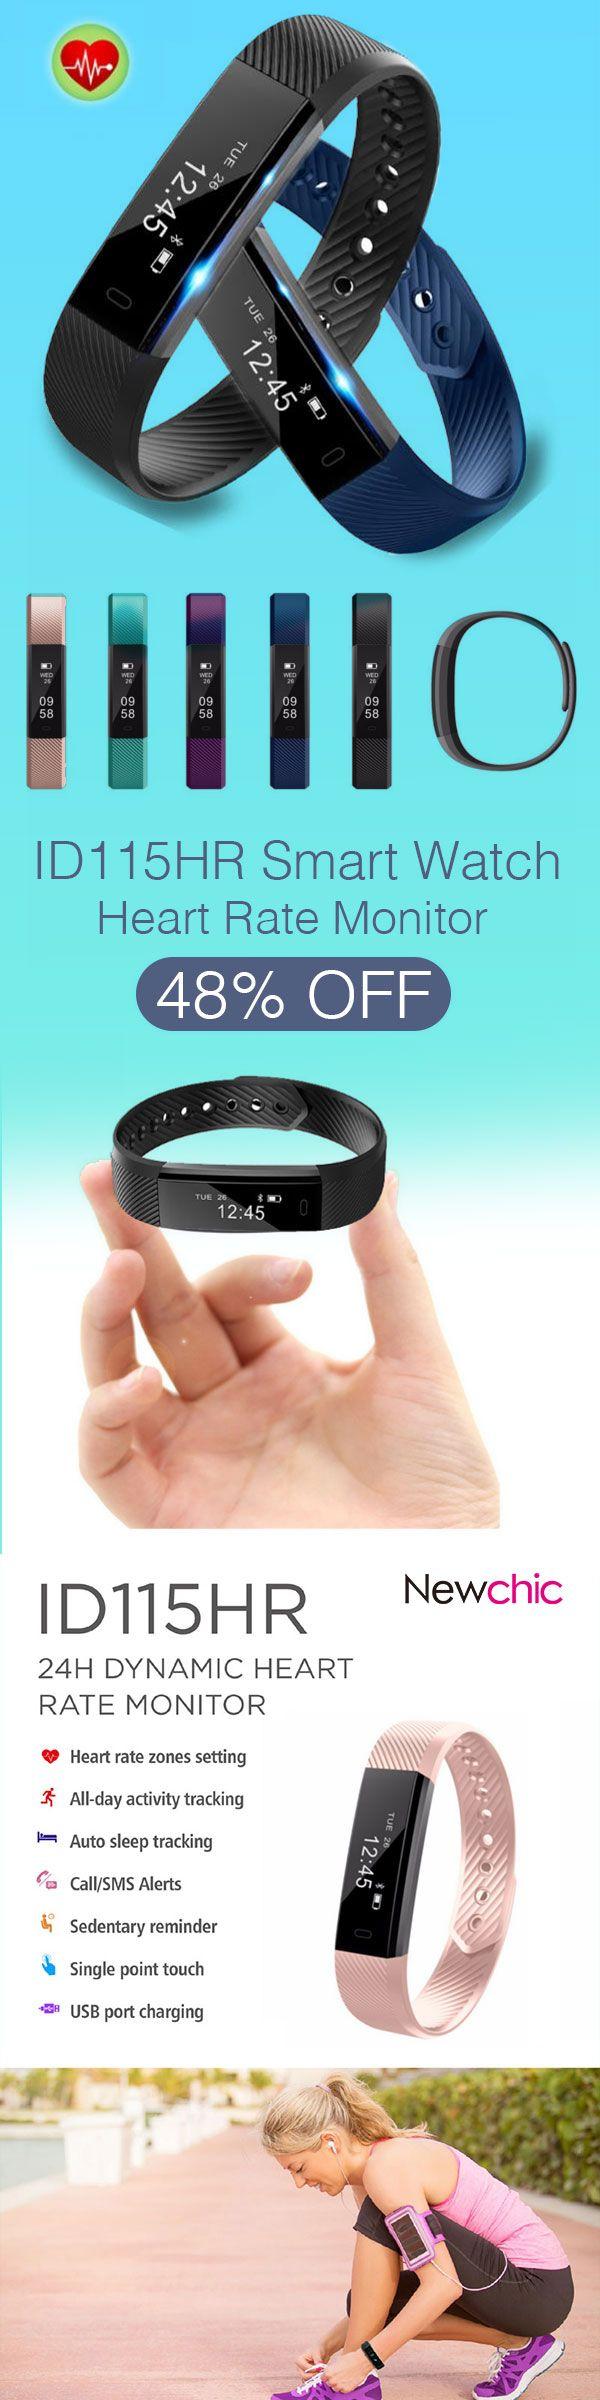 [Newchic Online Shopping] 48%OFF ID115HR Smart Watch | Heart Rate Monitor | Fitness Tracket | Wrist Watch | Fitness Tracker | Sleep Tracker